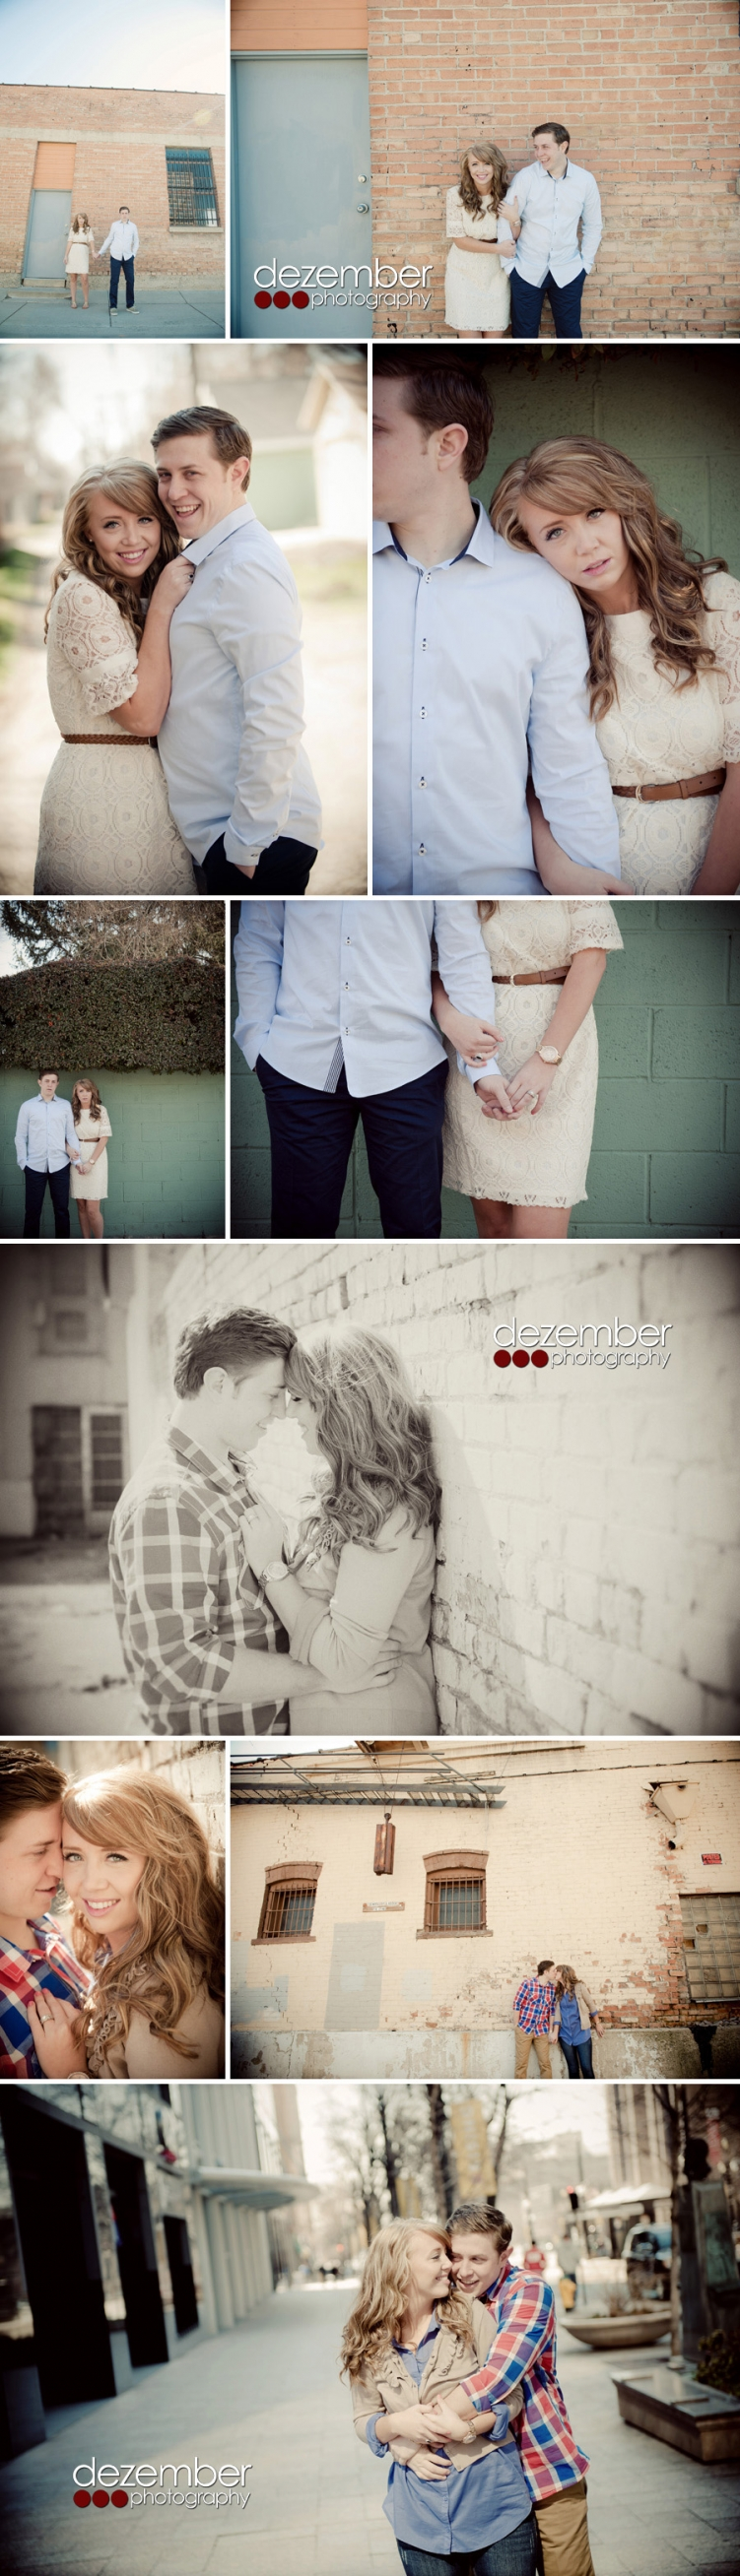 Luke jamie utah engagement photographers utah for Affordable utah wedding photographers